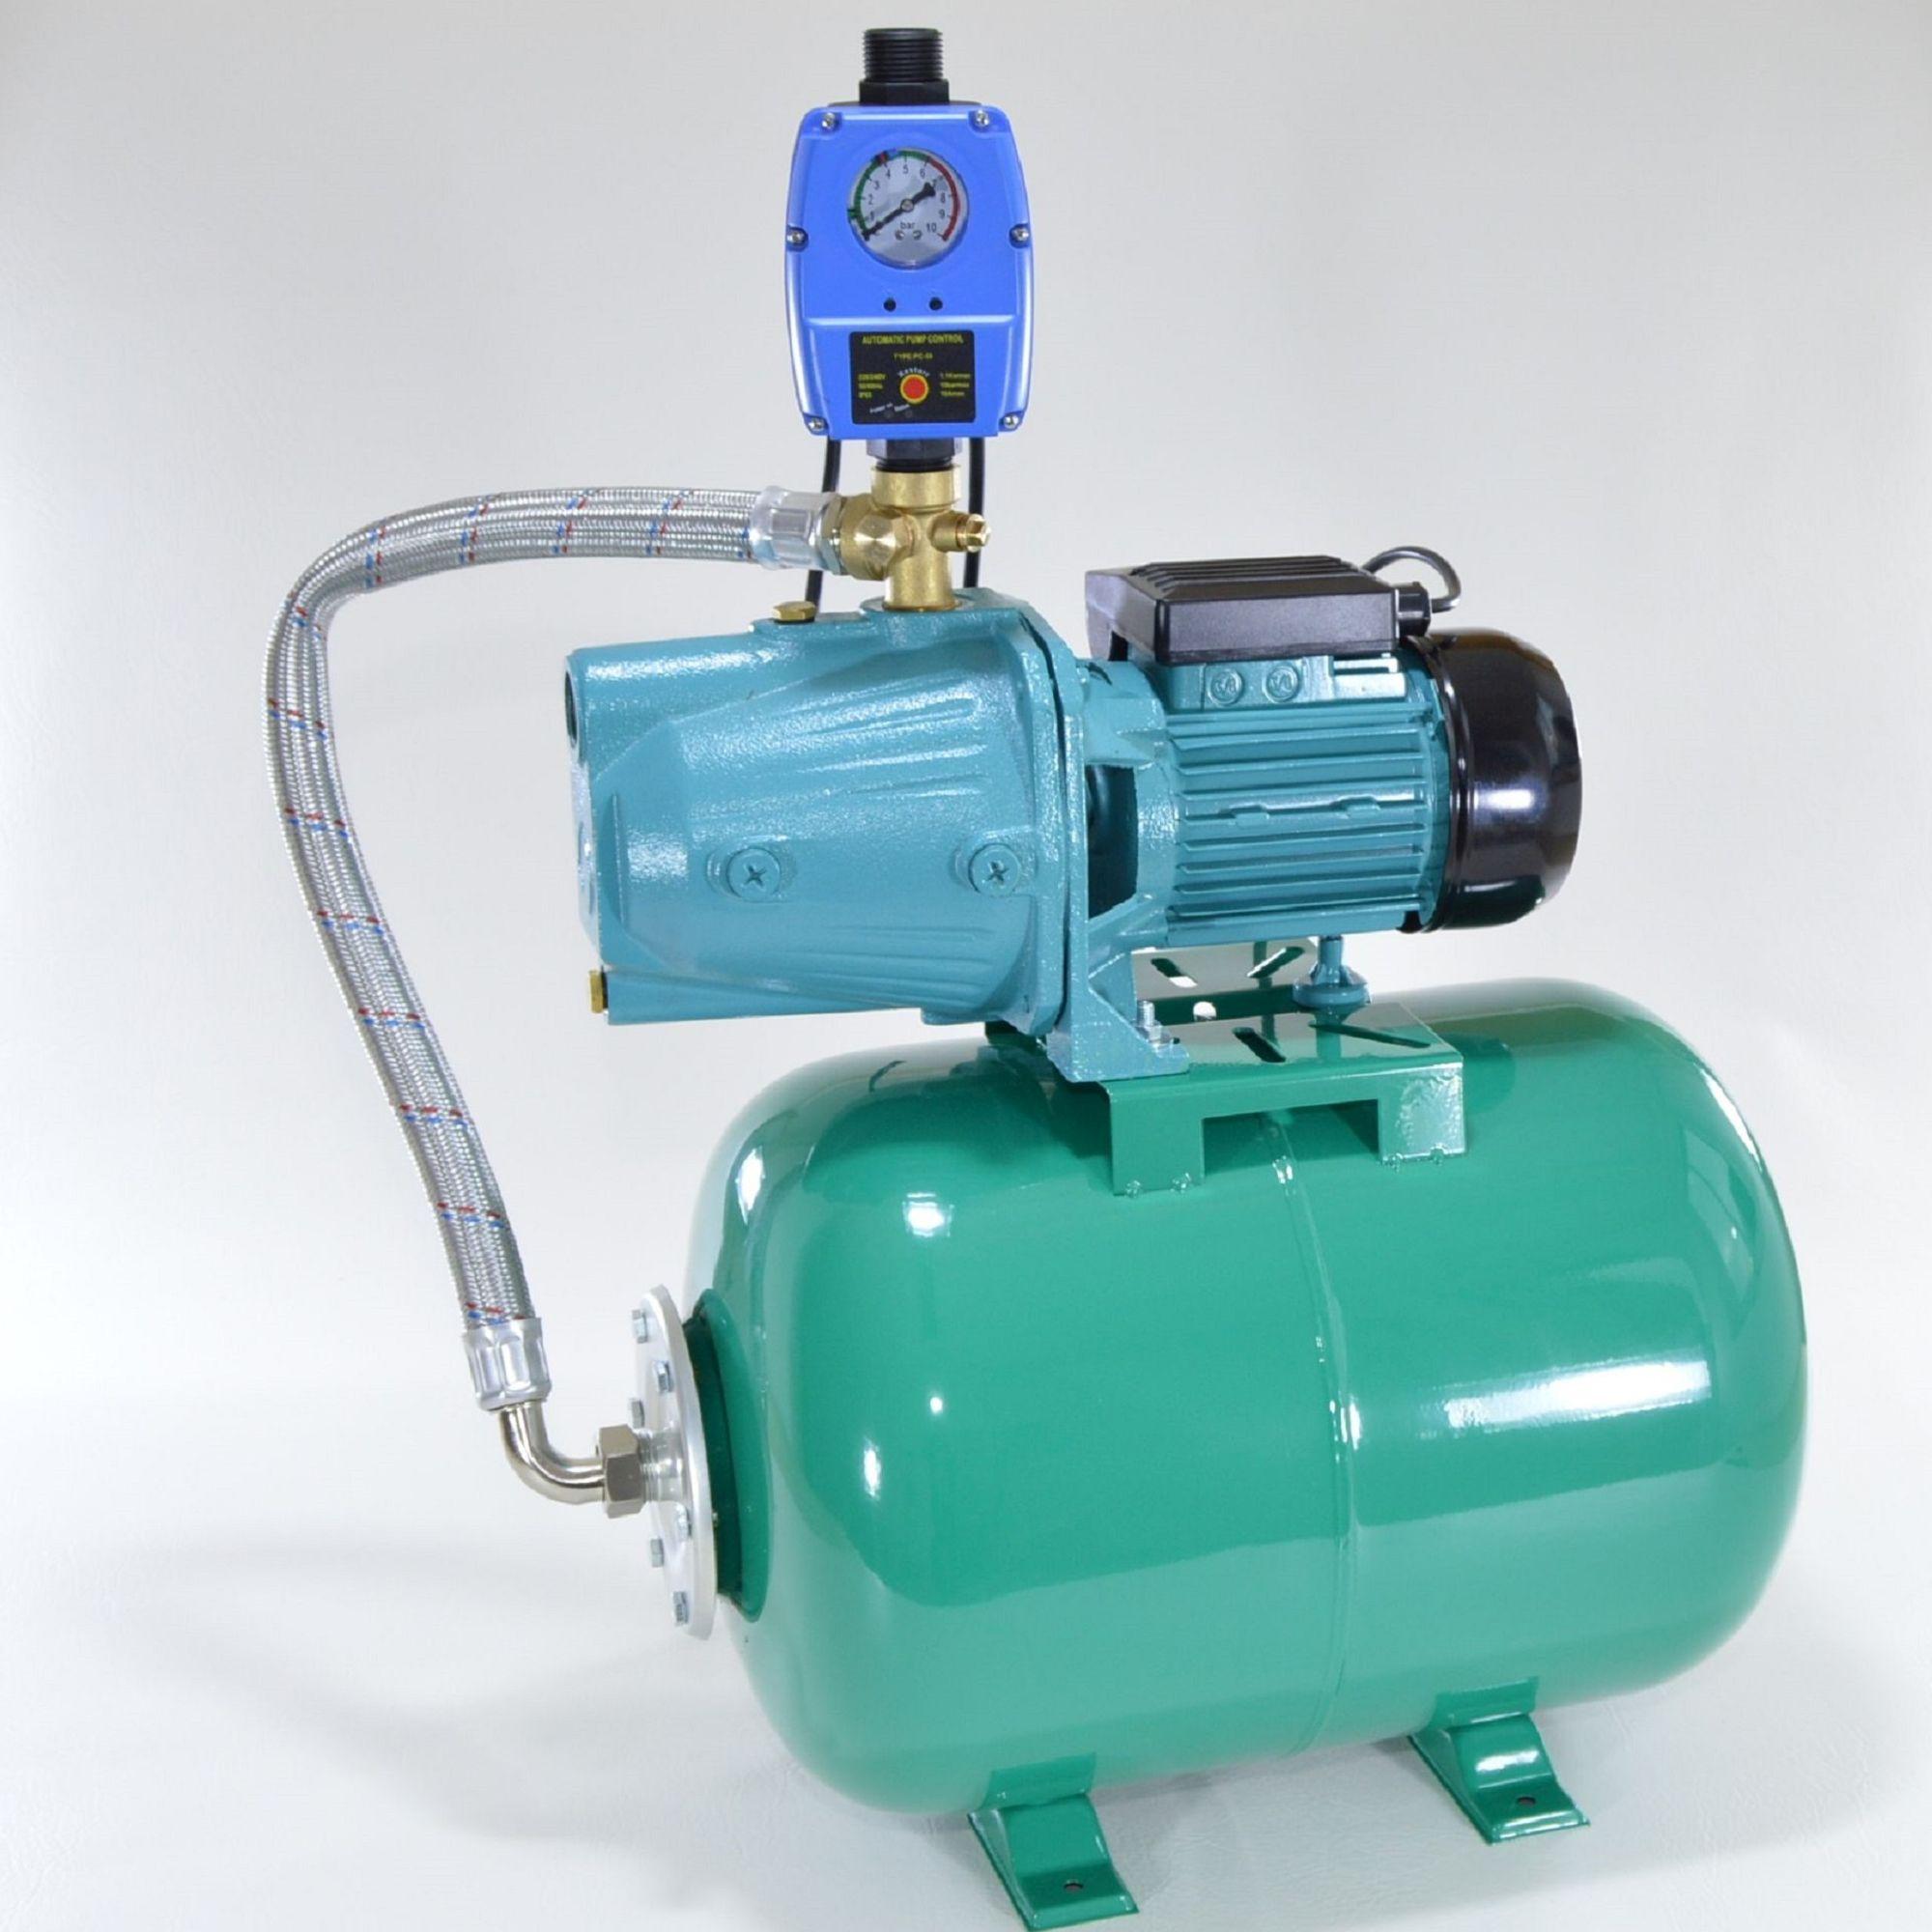 profi hauswasserwerk 50 liter kessel pumpe 1100 w hauswasserautomat gartenpumpe ebay. Black Bedroom Furniture Sets. Home Design Ideas